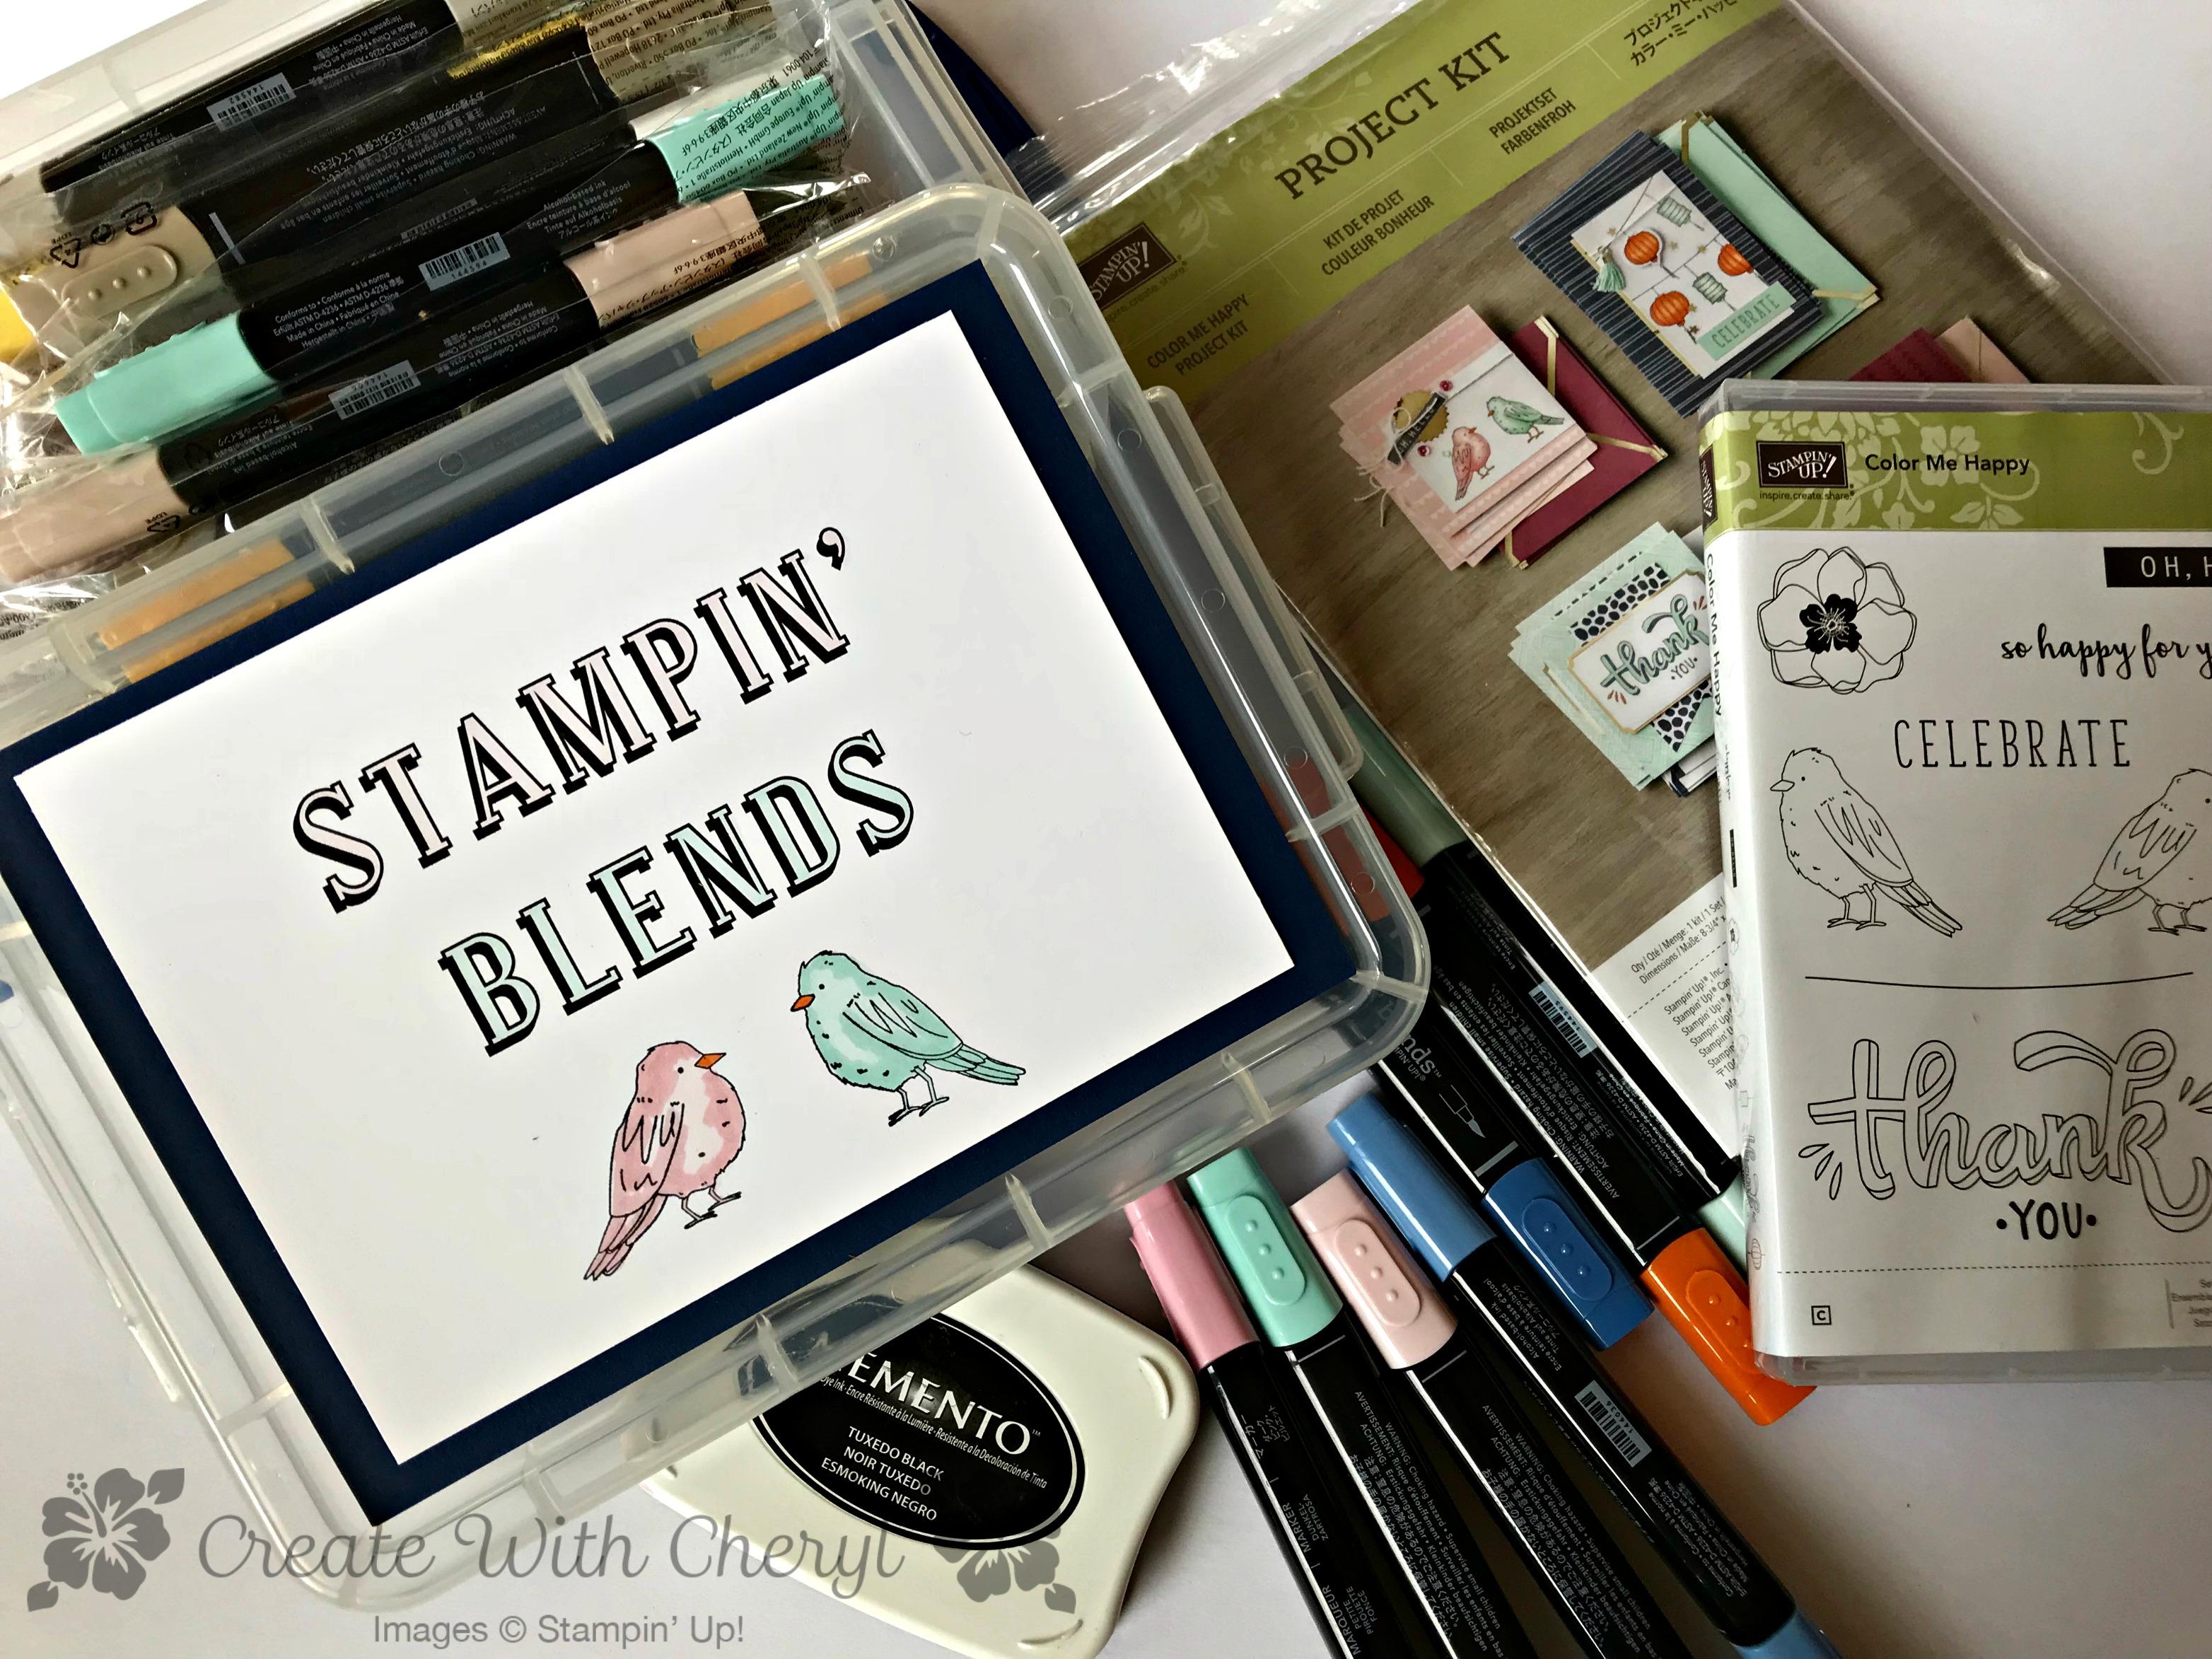 Stampin' Blends Club